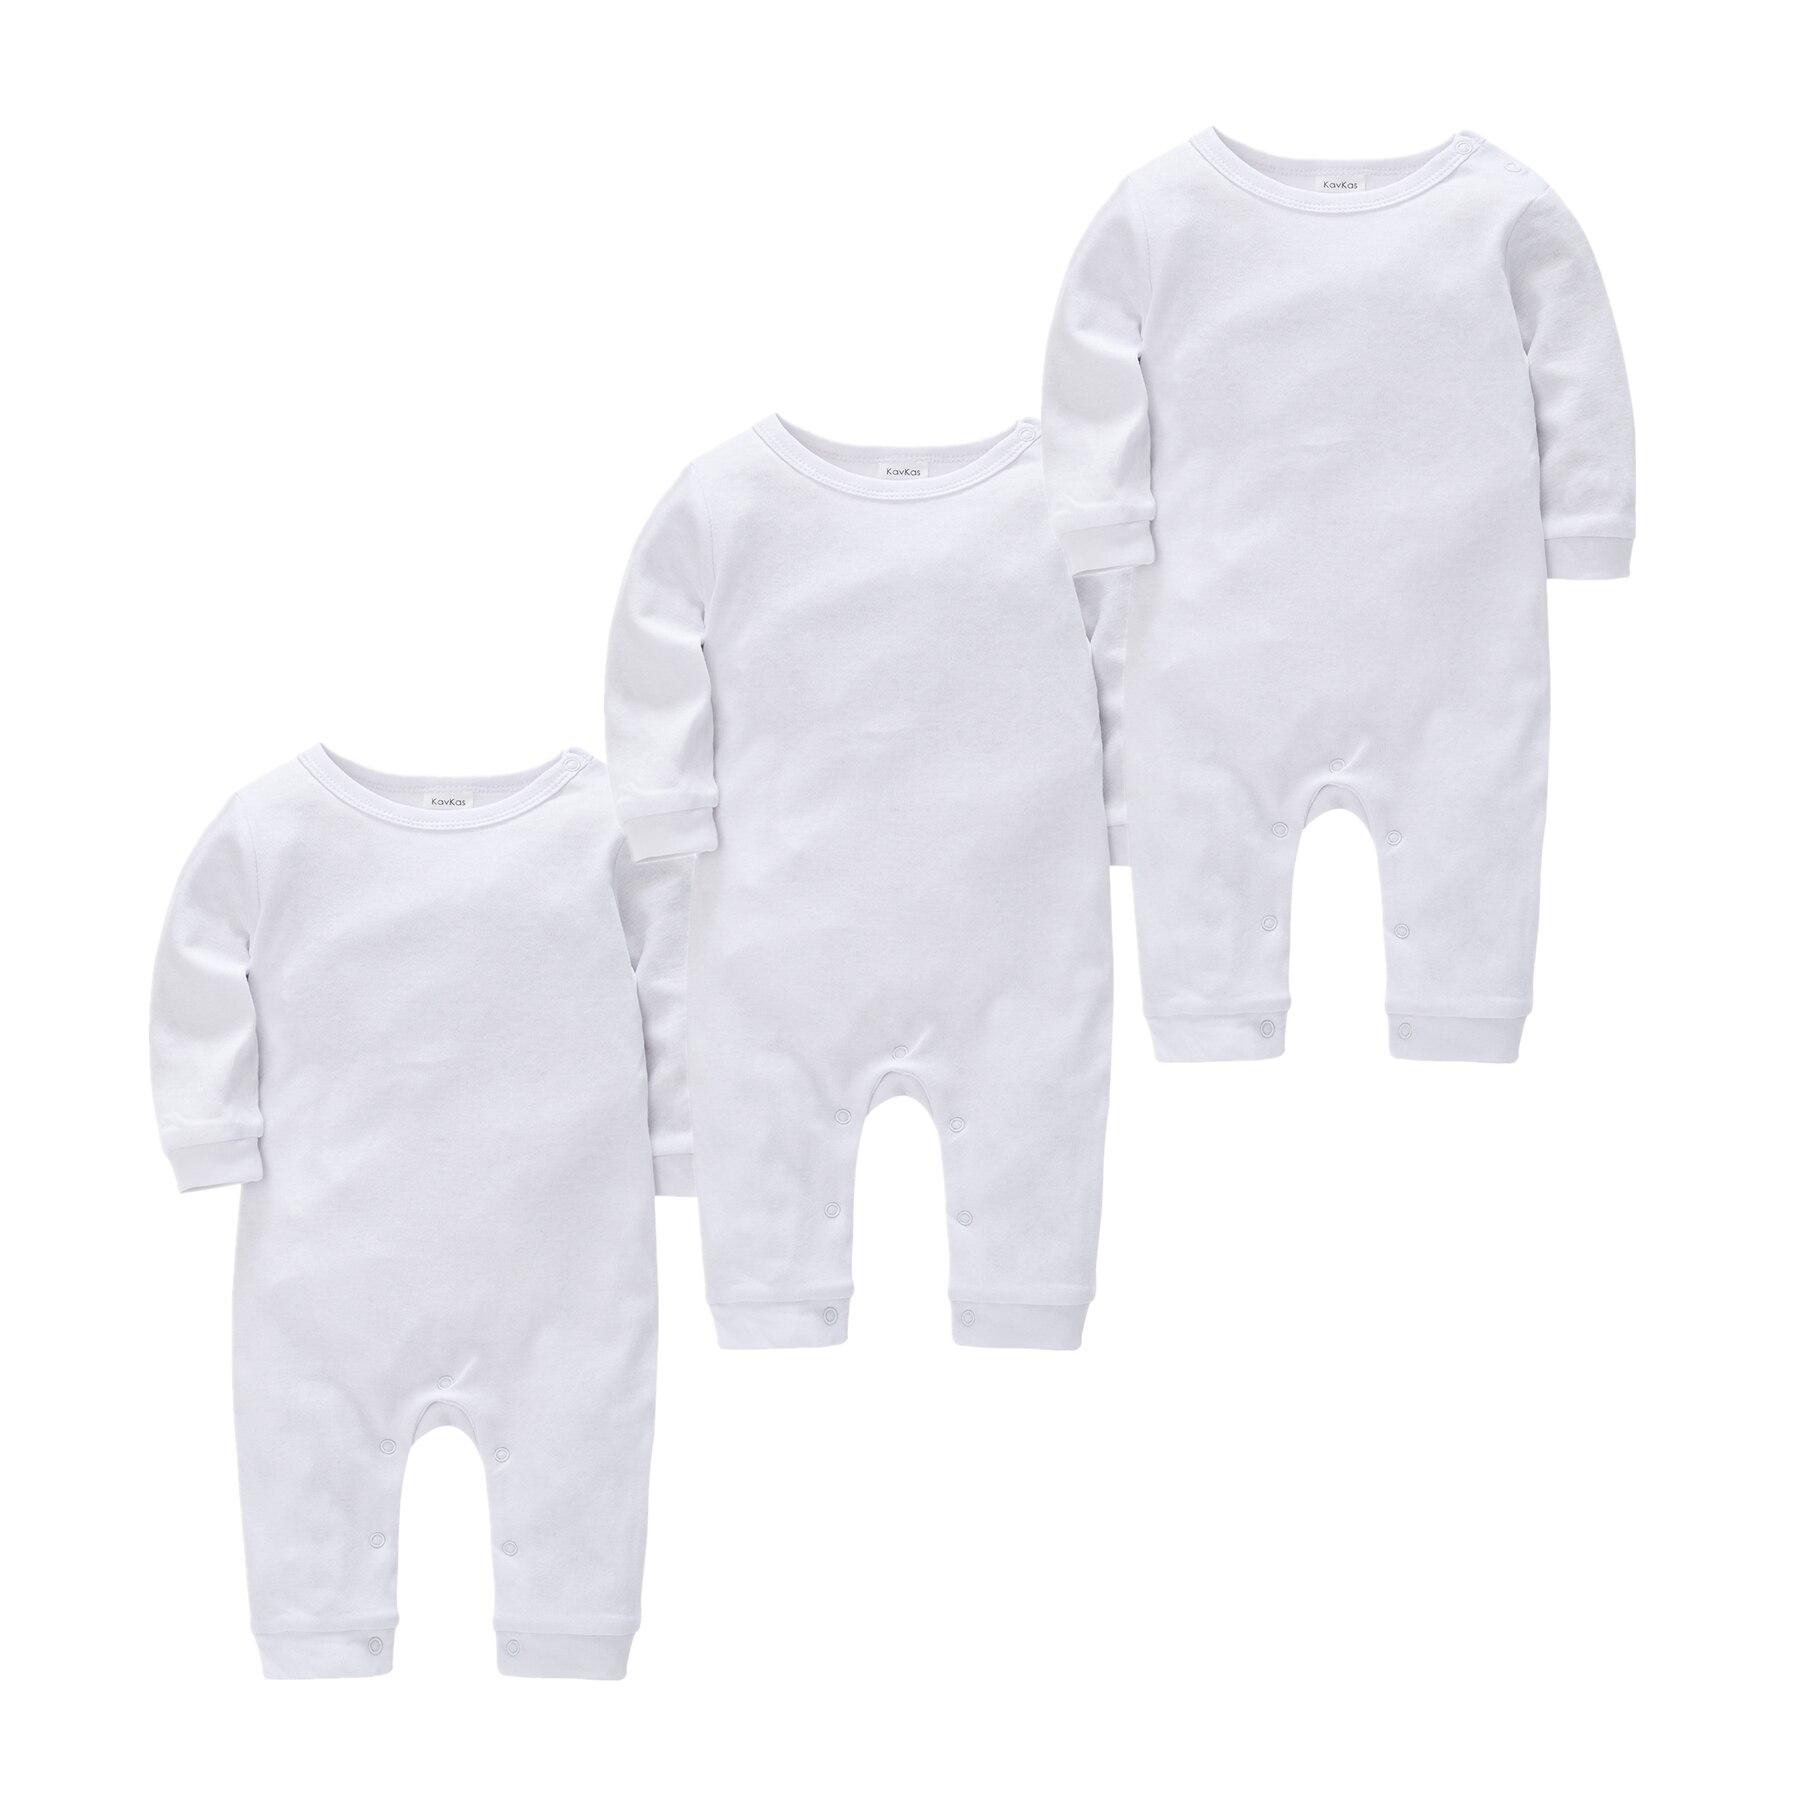 roupas bebe de Toddler Baby Boys Jumpsuits Onesie Pijamas 100% Cotton Soft Overalls ropa bebe Newborn Sleepers Baby Coverall